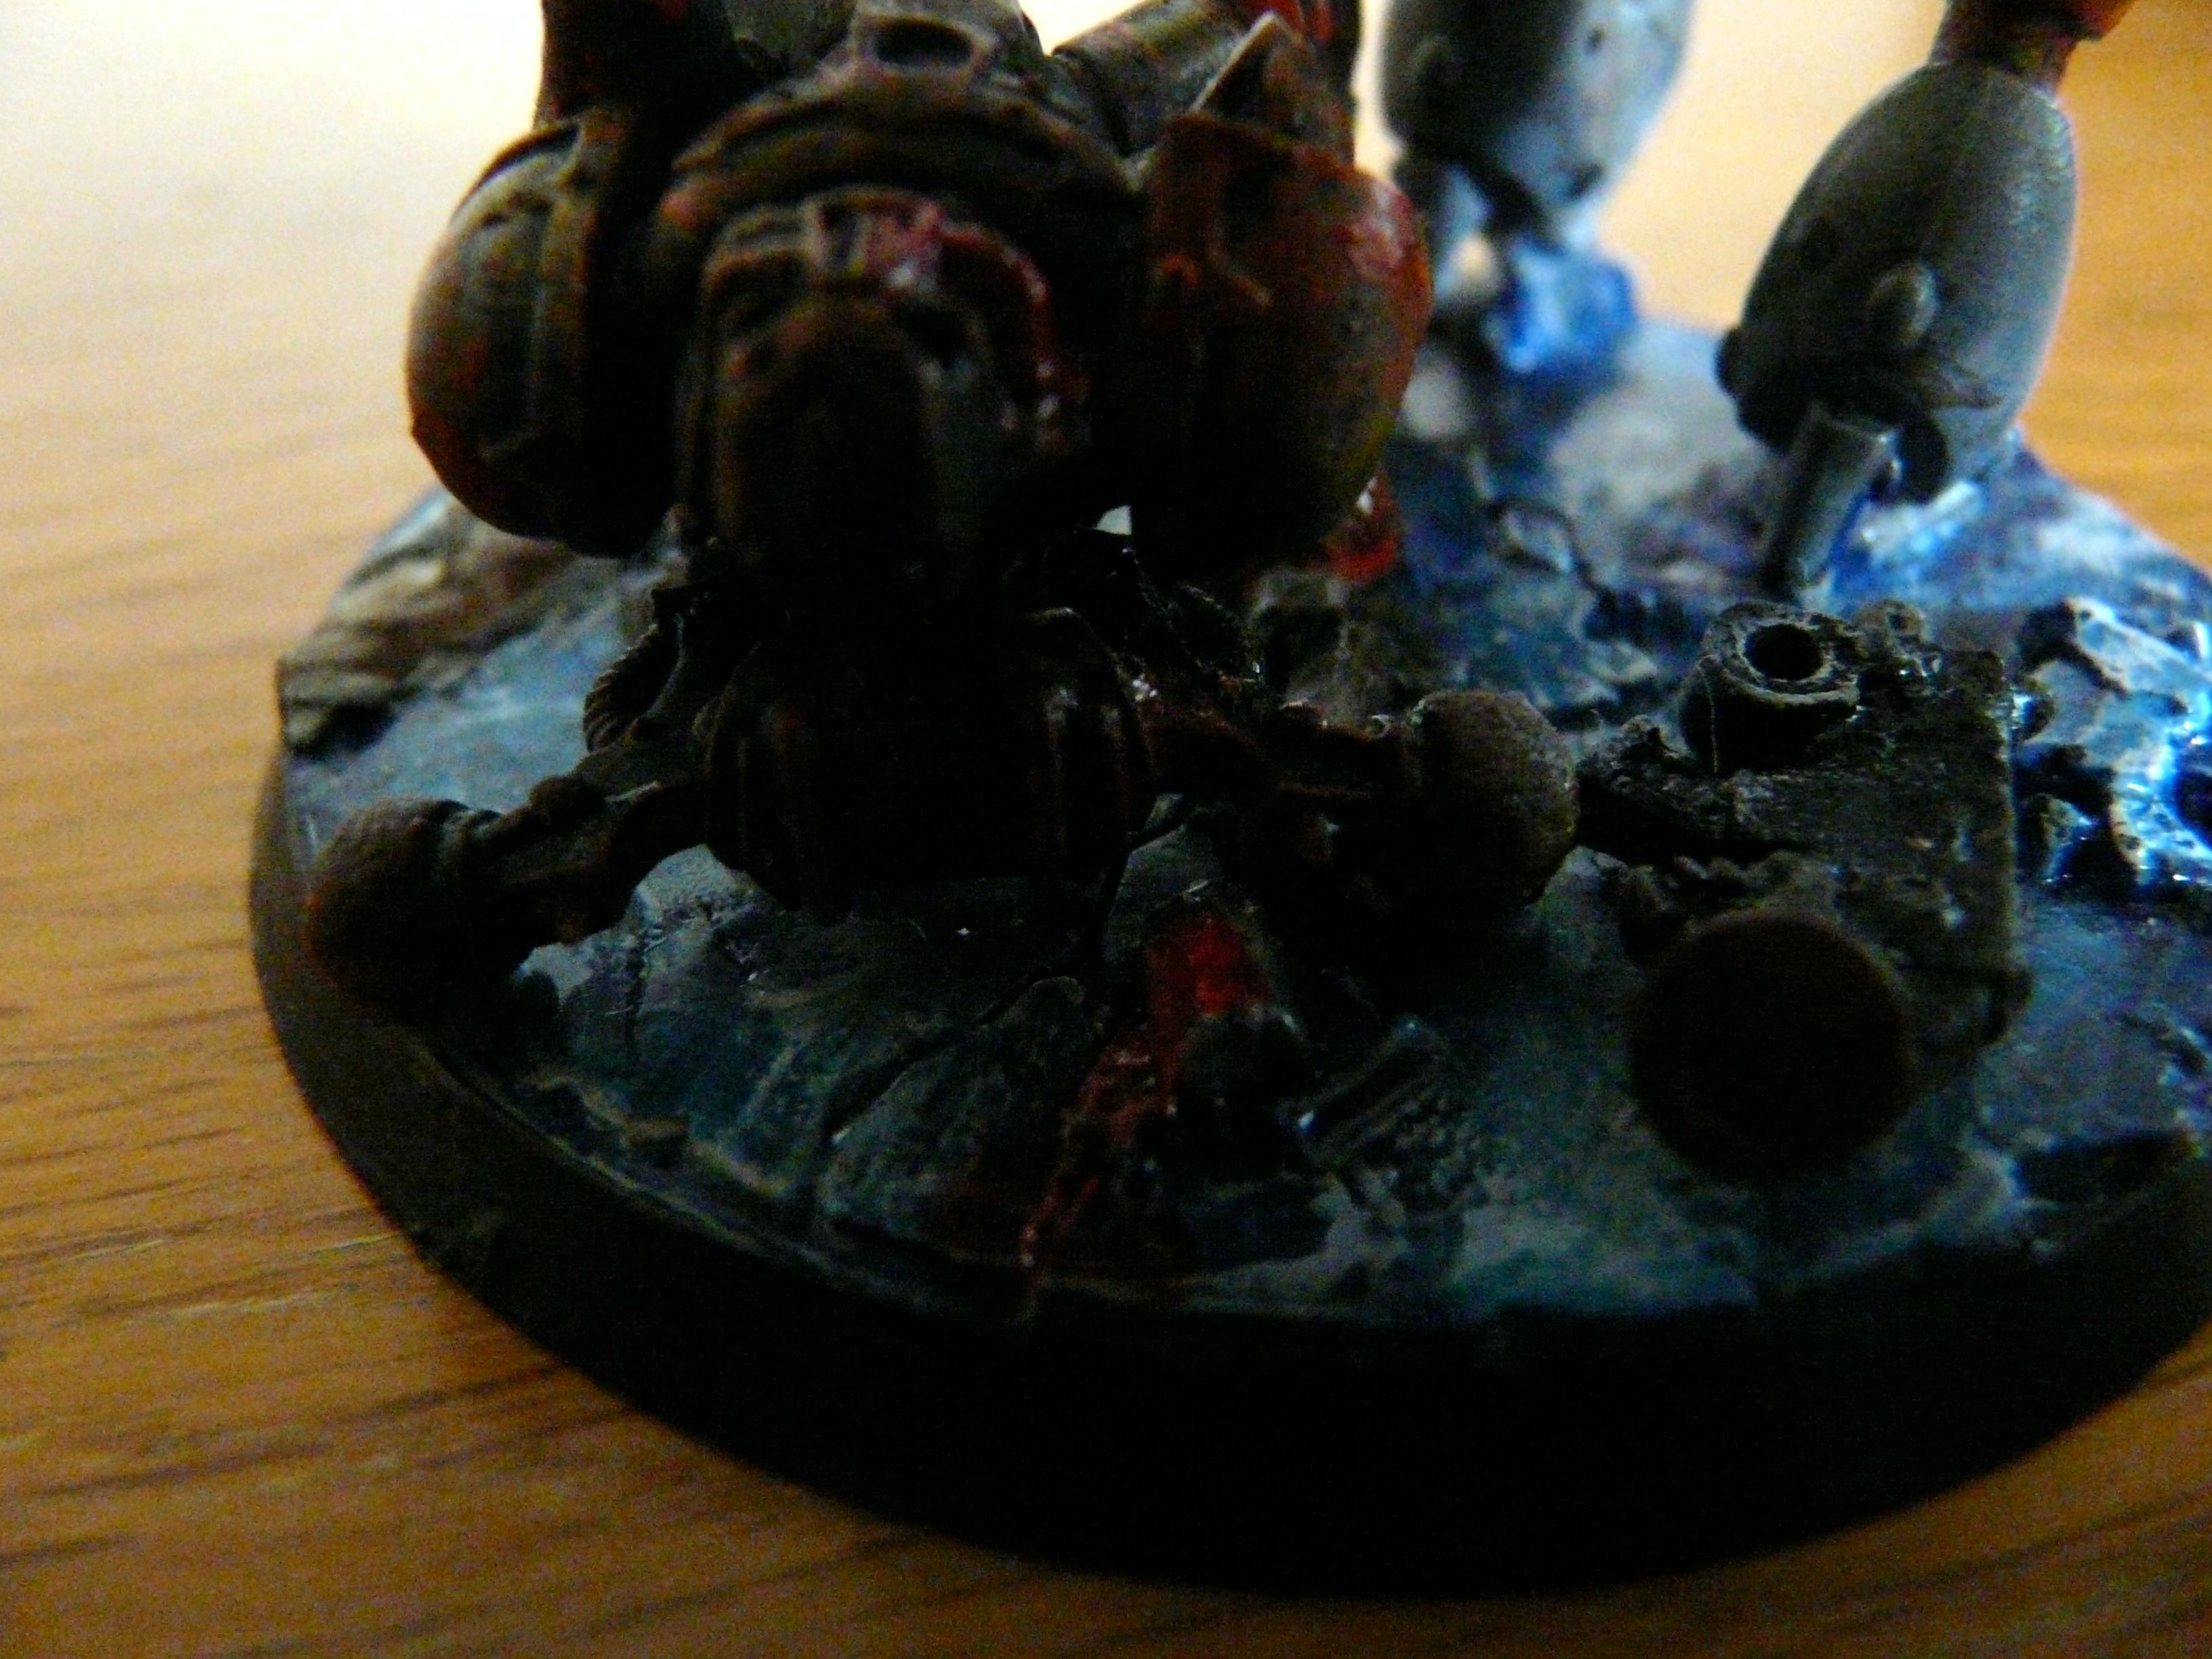 Eldar, Wraithlord, Wraithlord 2.3